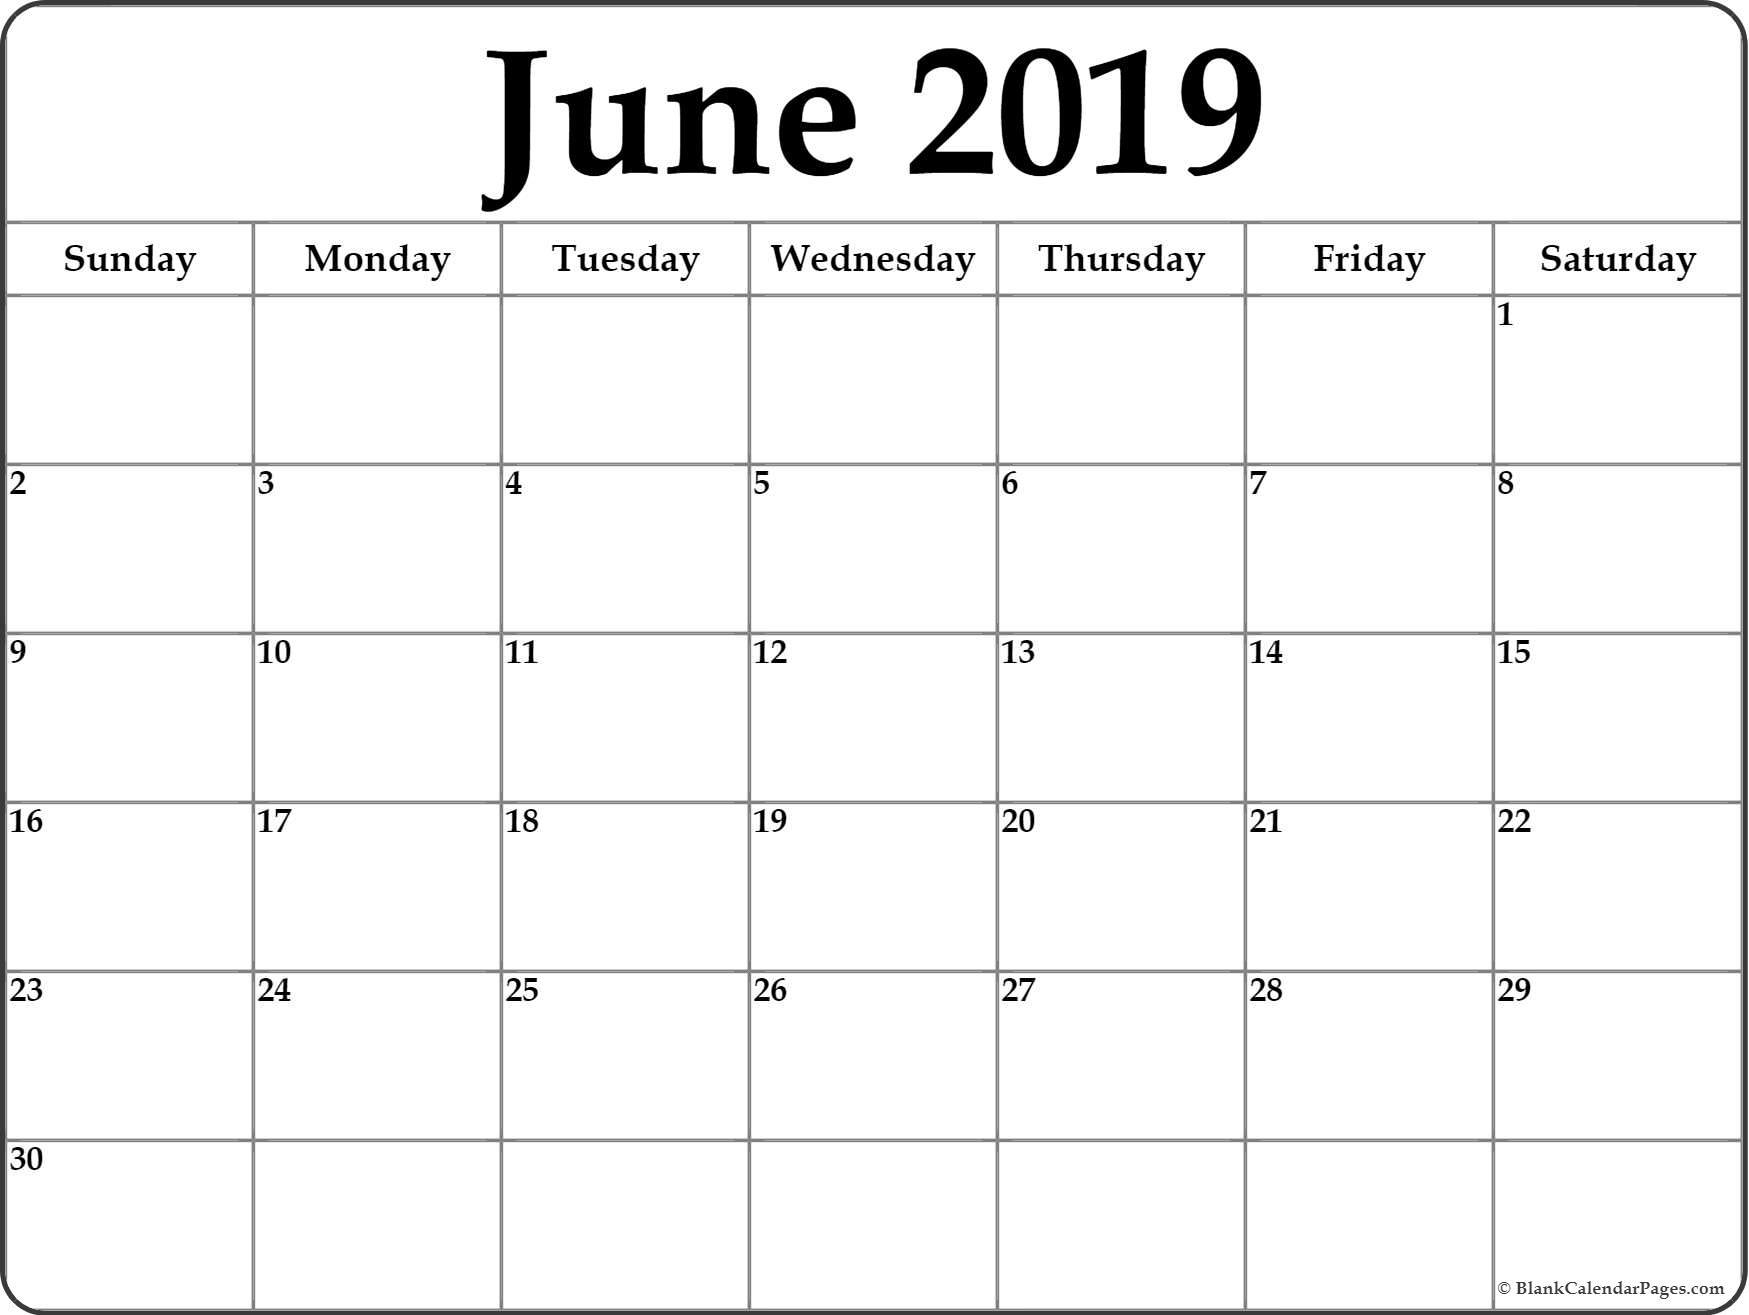 June 2019 Calendar | Free Printable Monthly Calendars pertaining to Fill In Printable Monthly Calendar